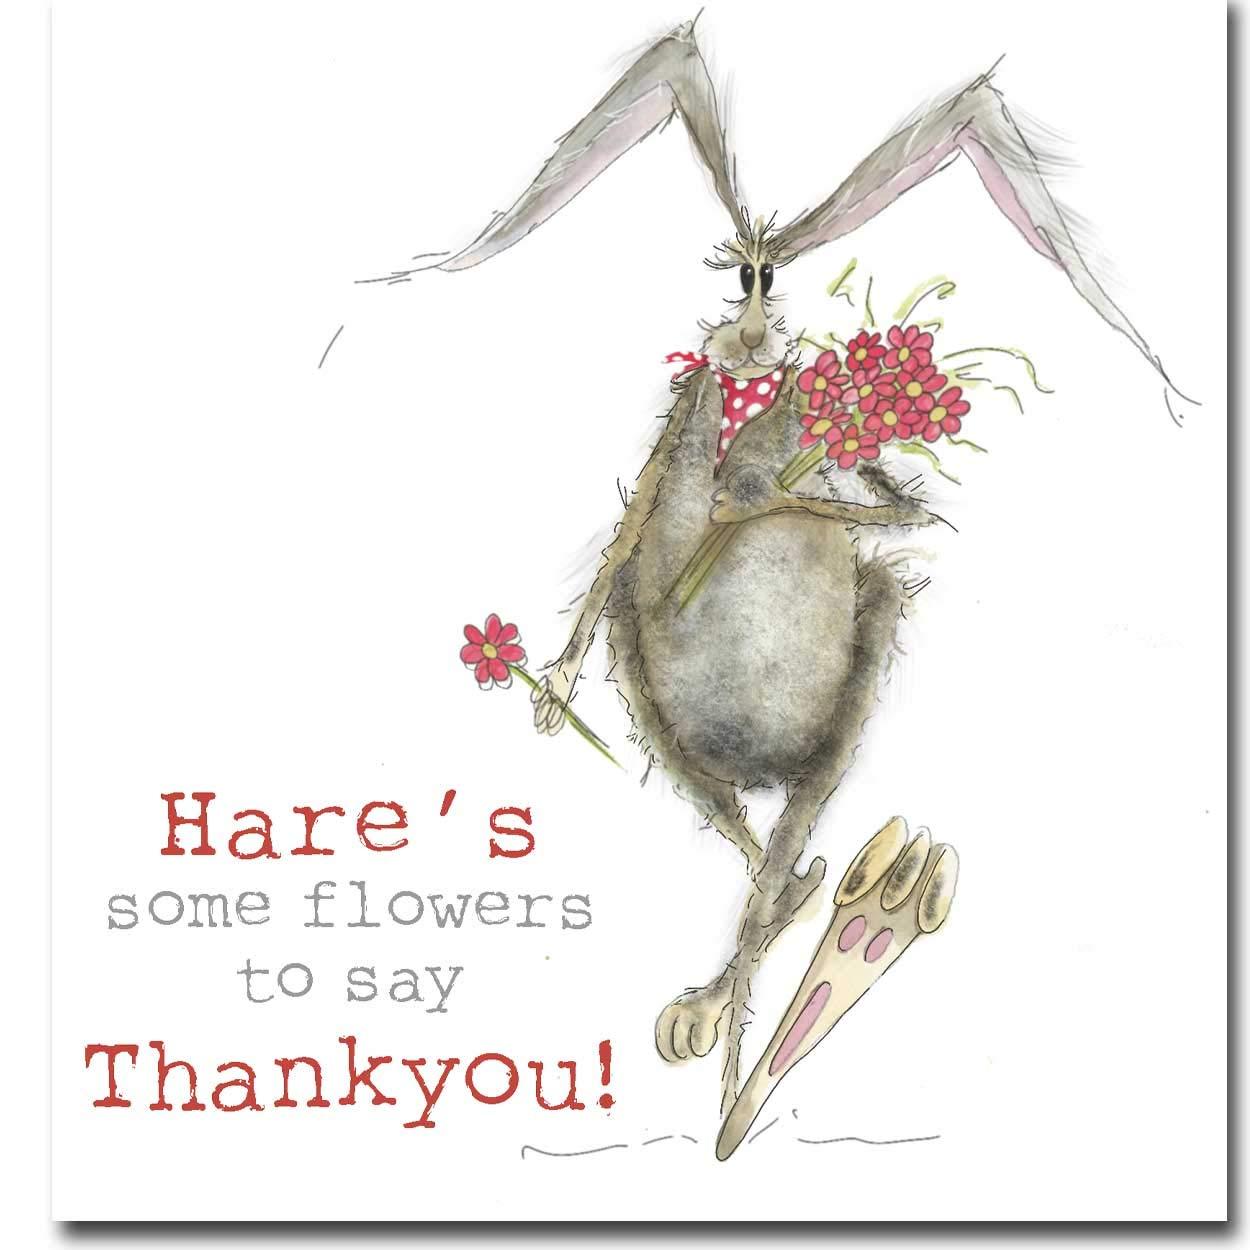 Hare's Some Flowers to say Thankyou! Dankeskarte, blanko, Innenseite